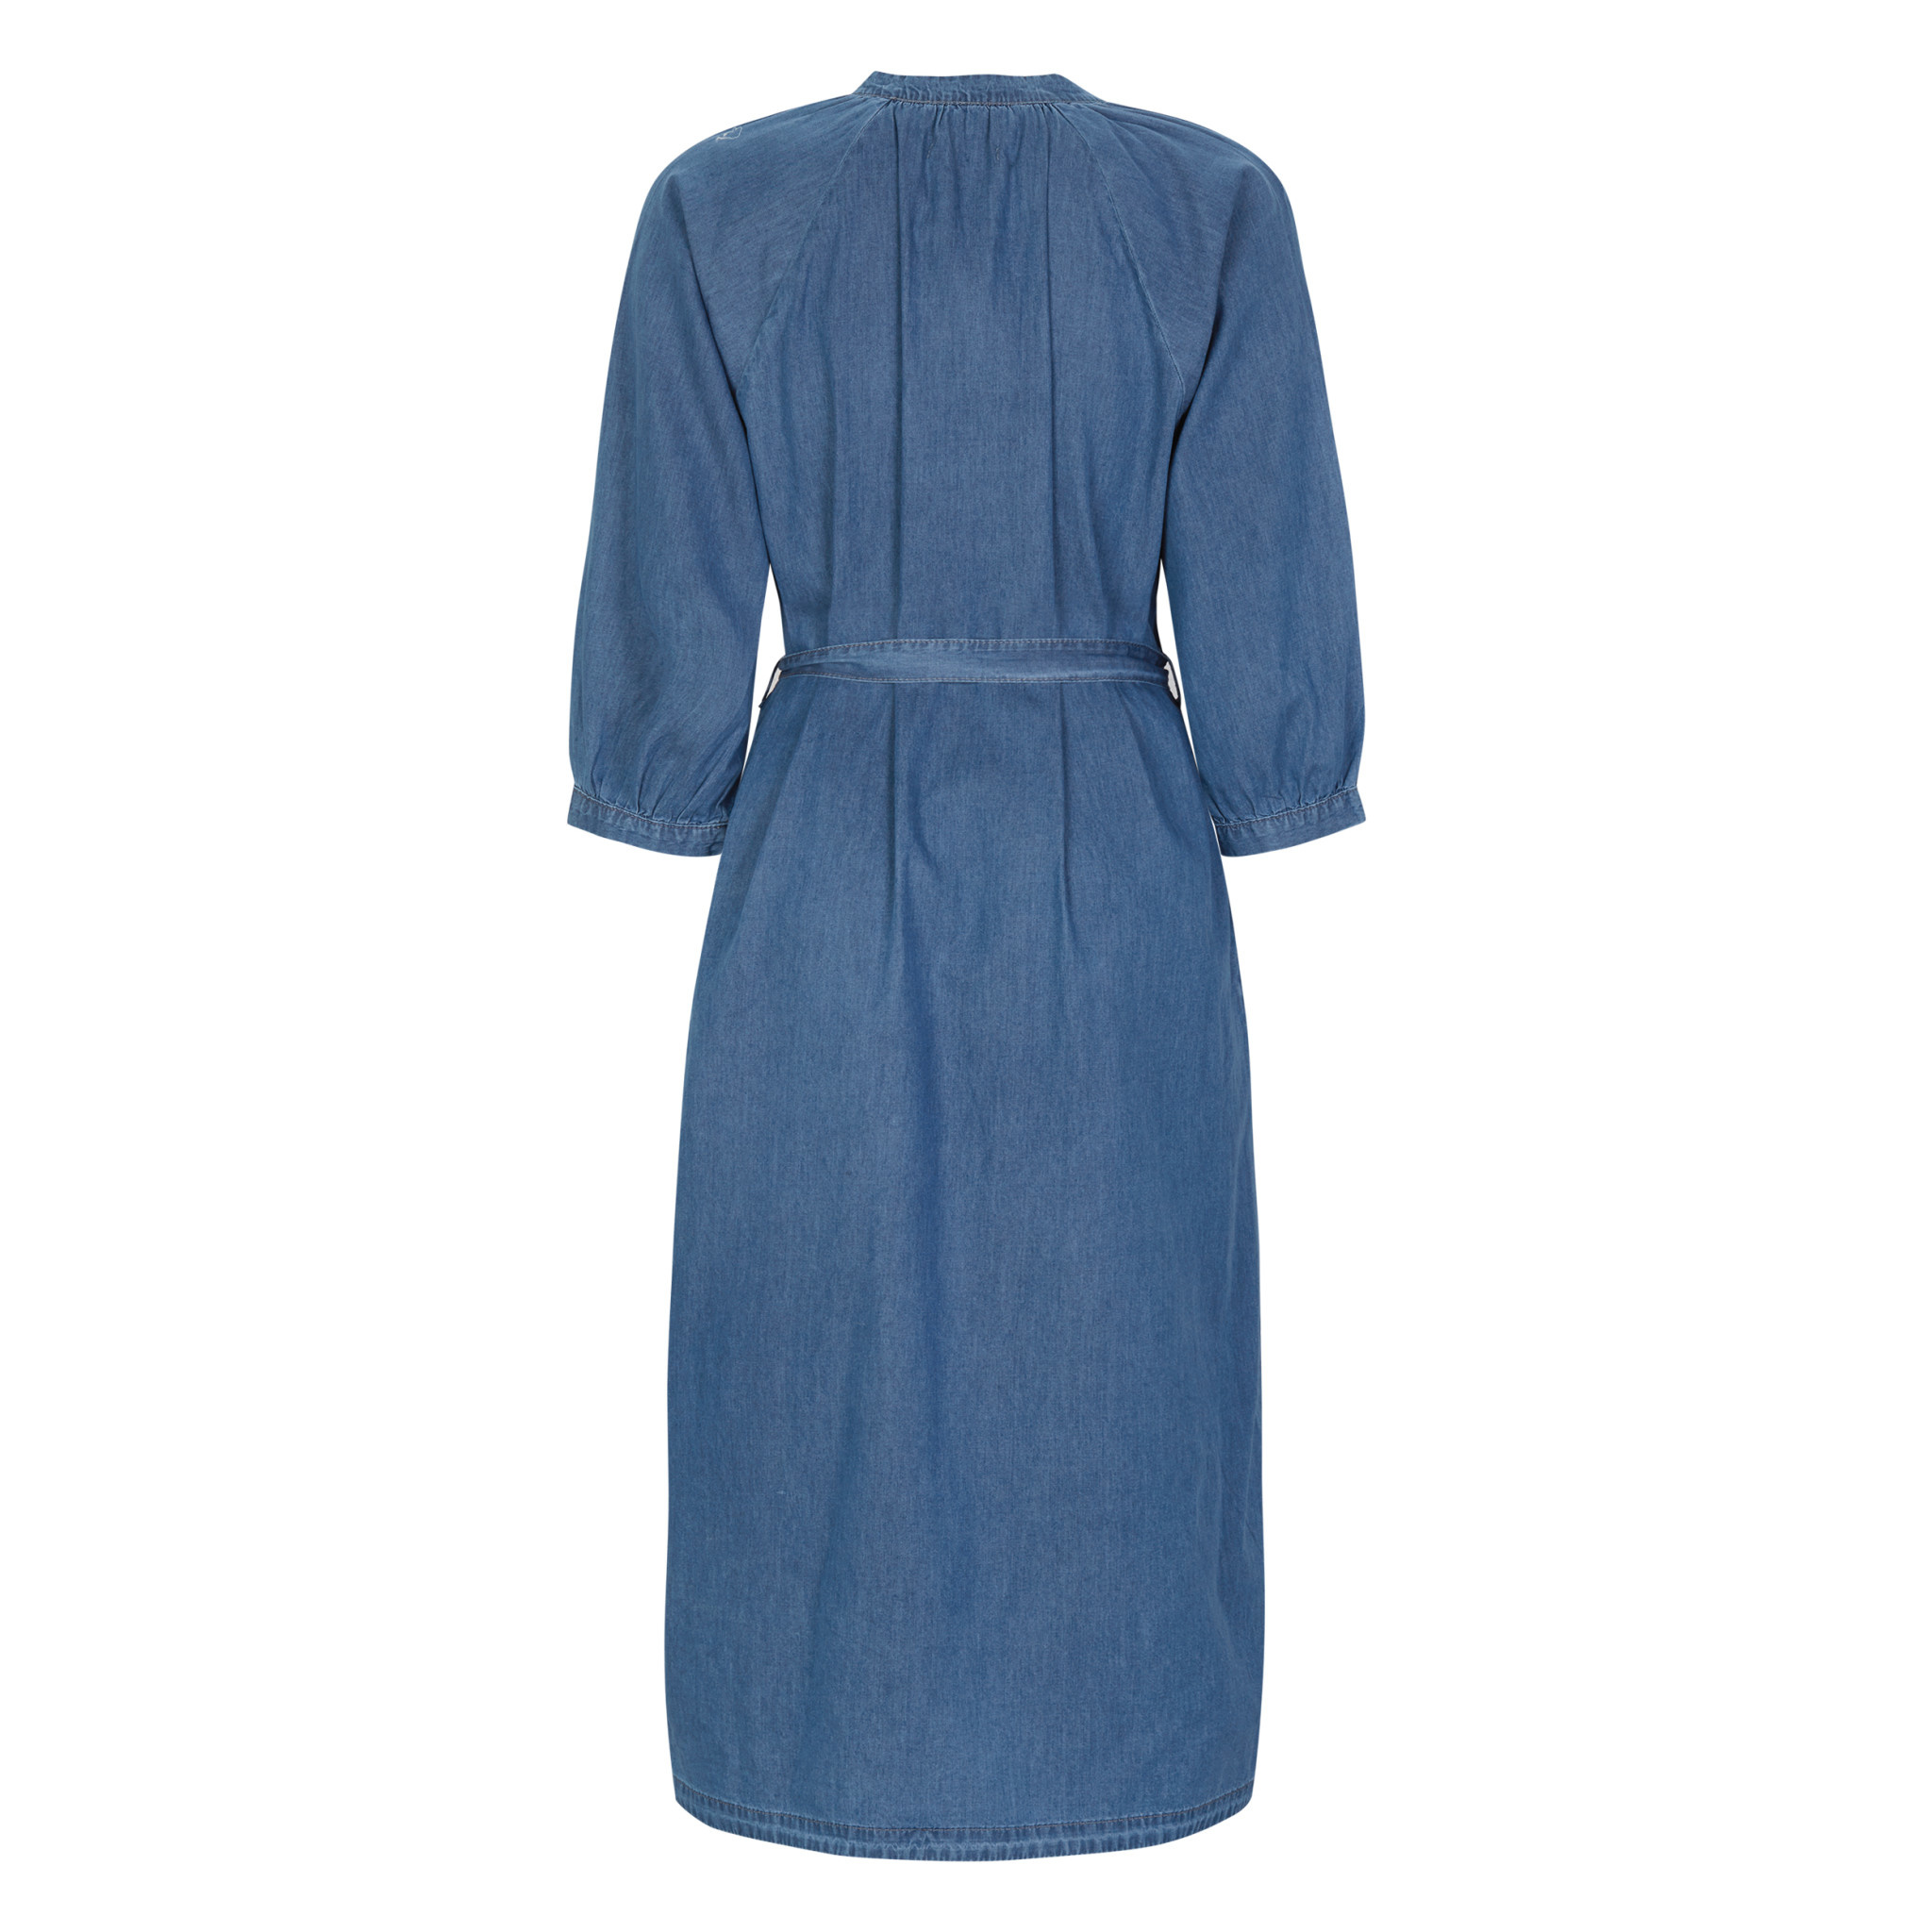 Soft Rebels Smurf midi dress